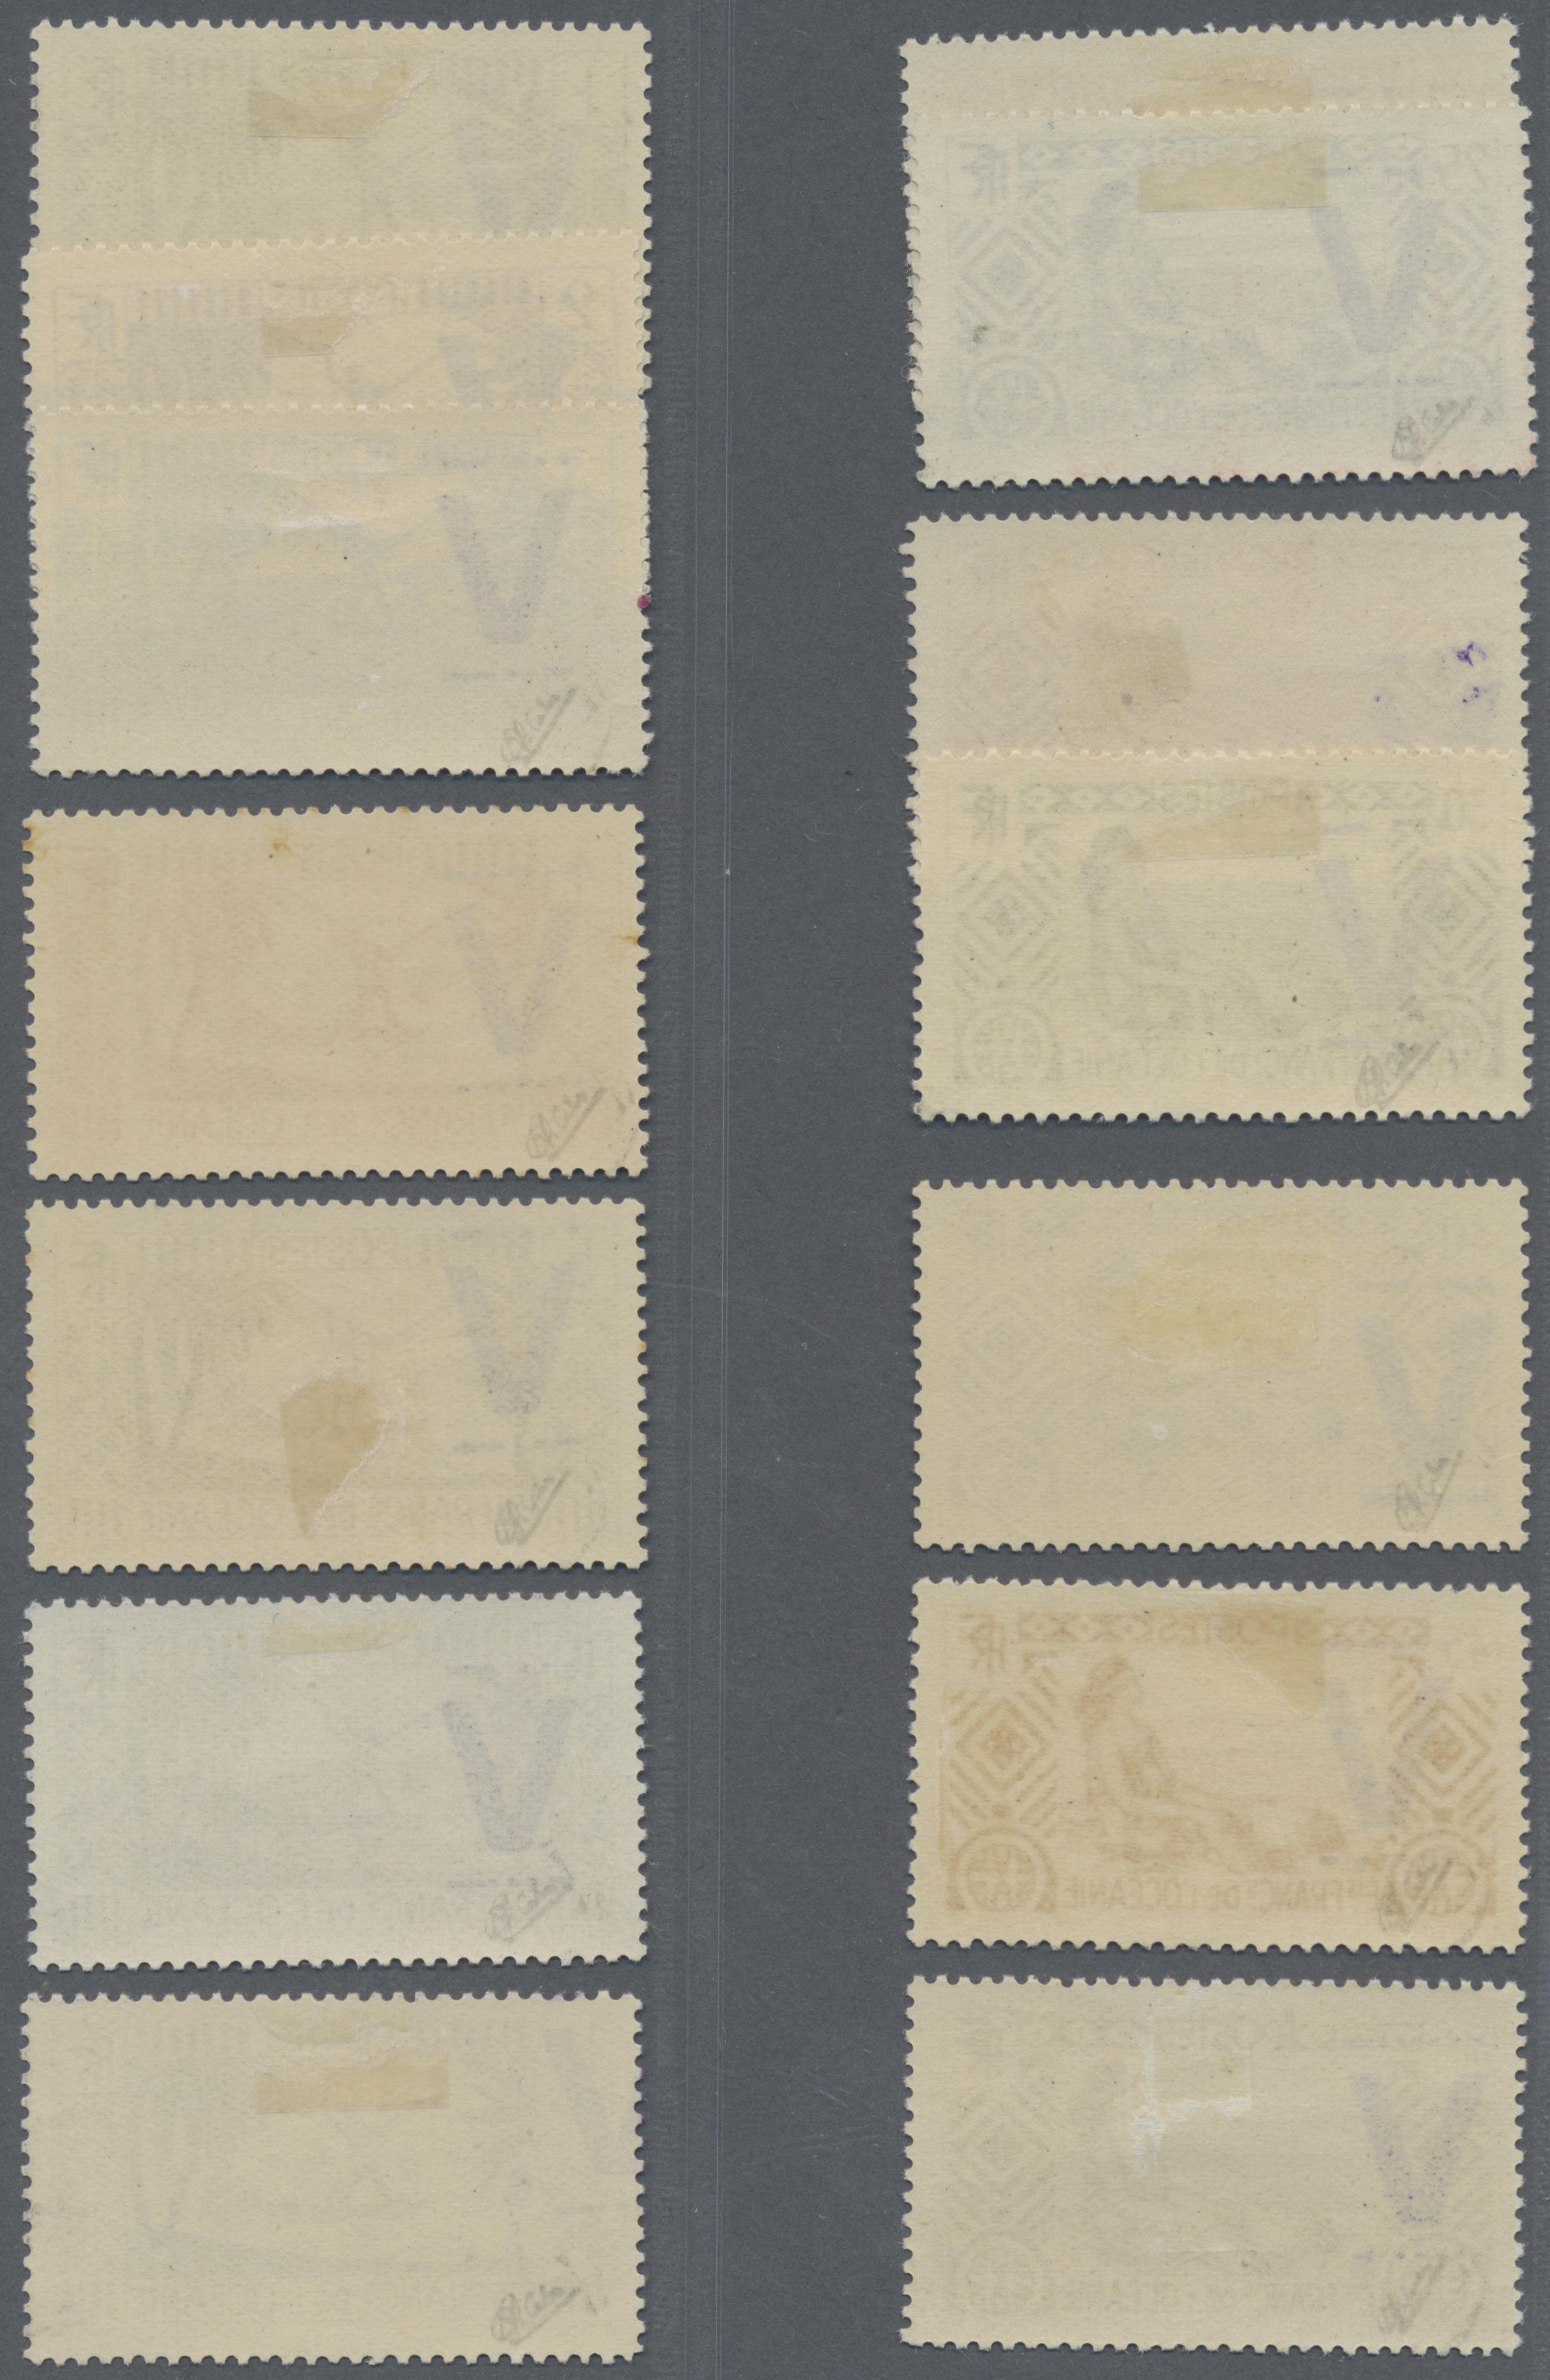 Lot 13751 - französisch-ozeanien  -  Auktionshaus Christoph Gärtner GmbH & Co. KG Single lots Philately Overseas & Europe. Auction #39 Day 4